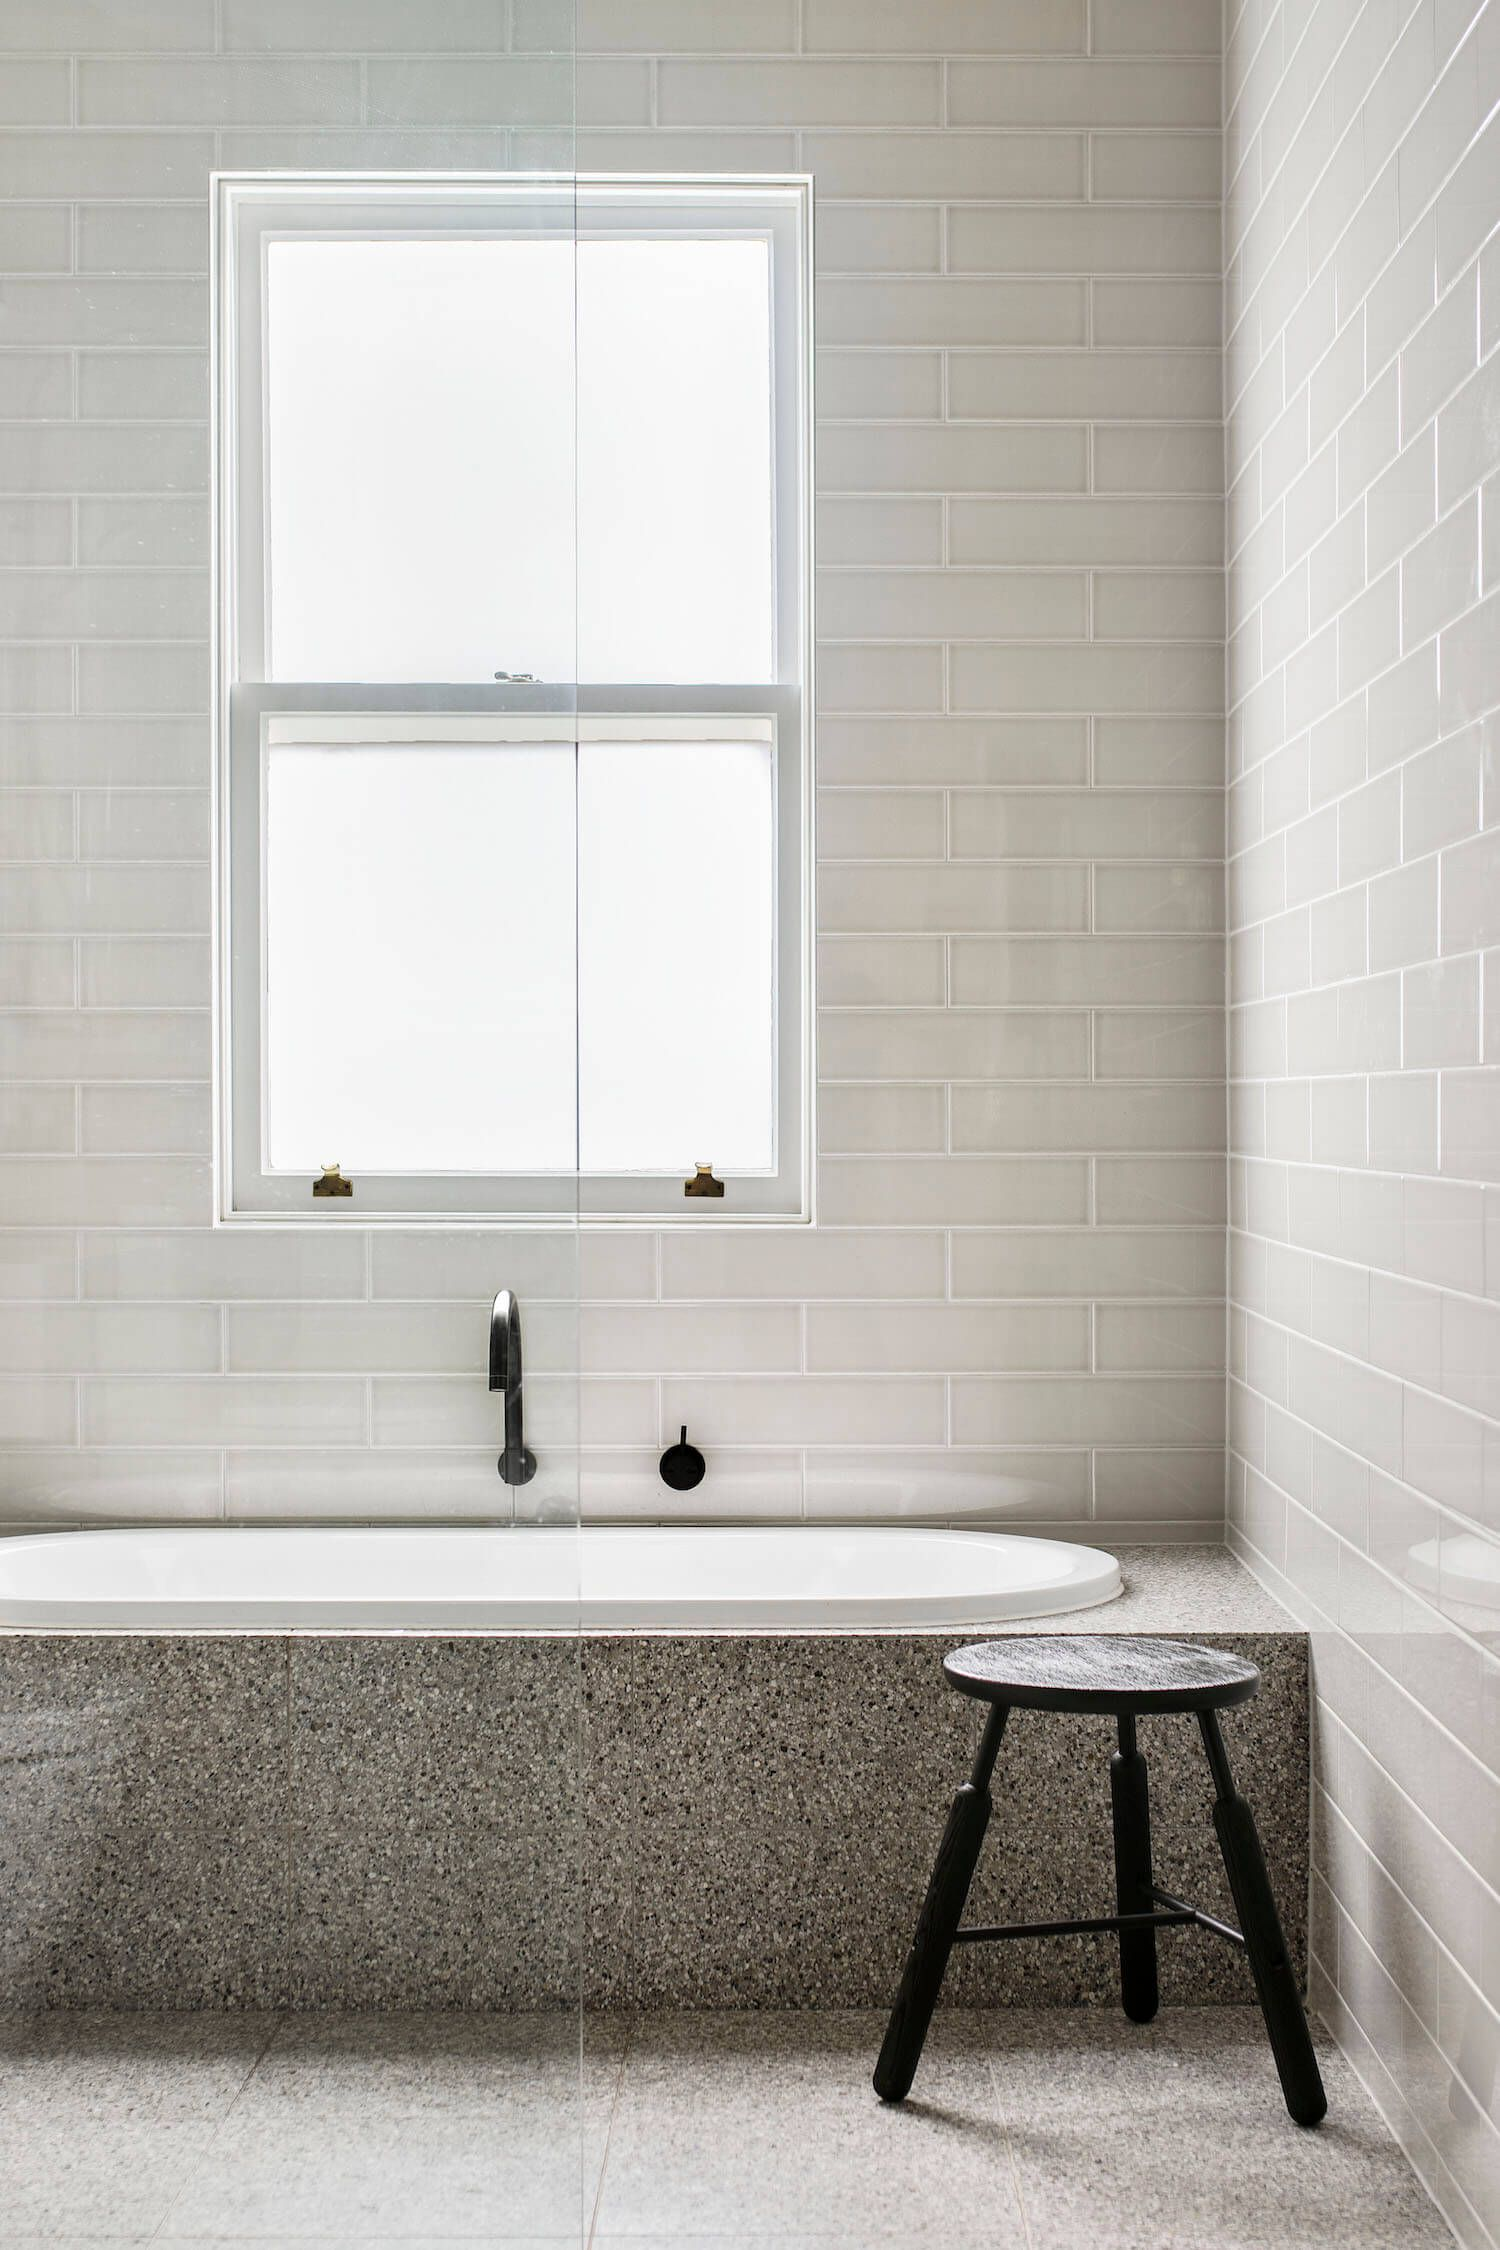 stunning living at home badezimmer contemporary. Black Bedroom Furniture Sets. Home Design Ideas